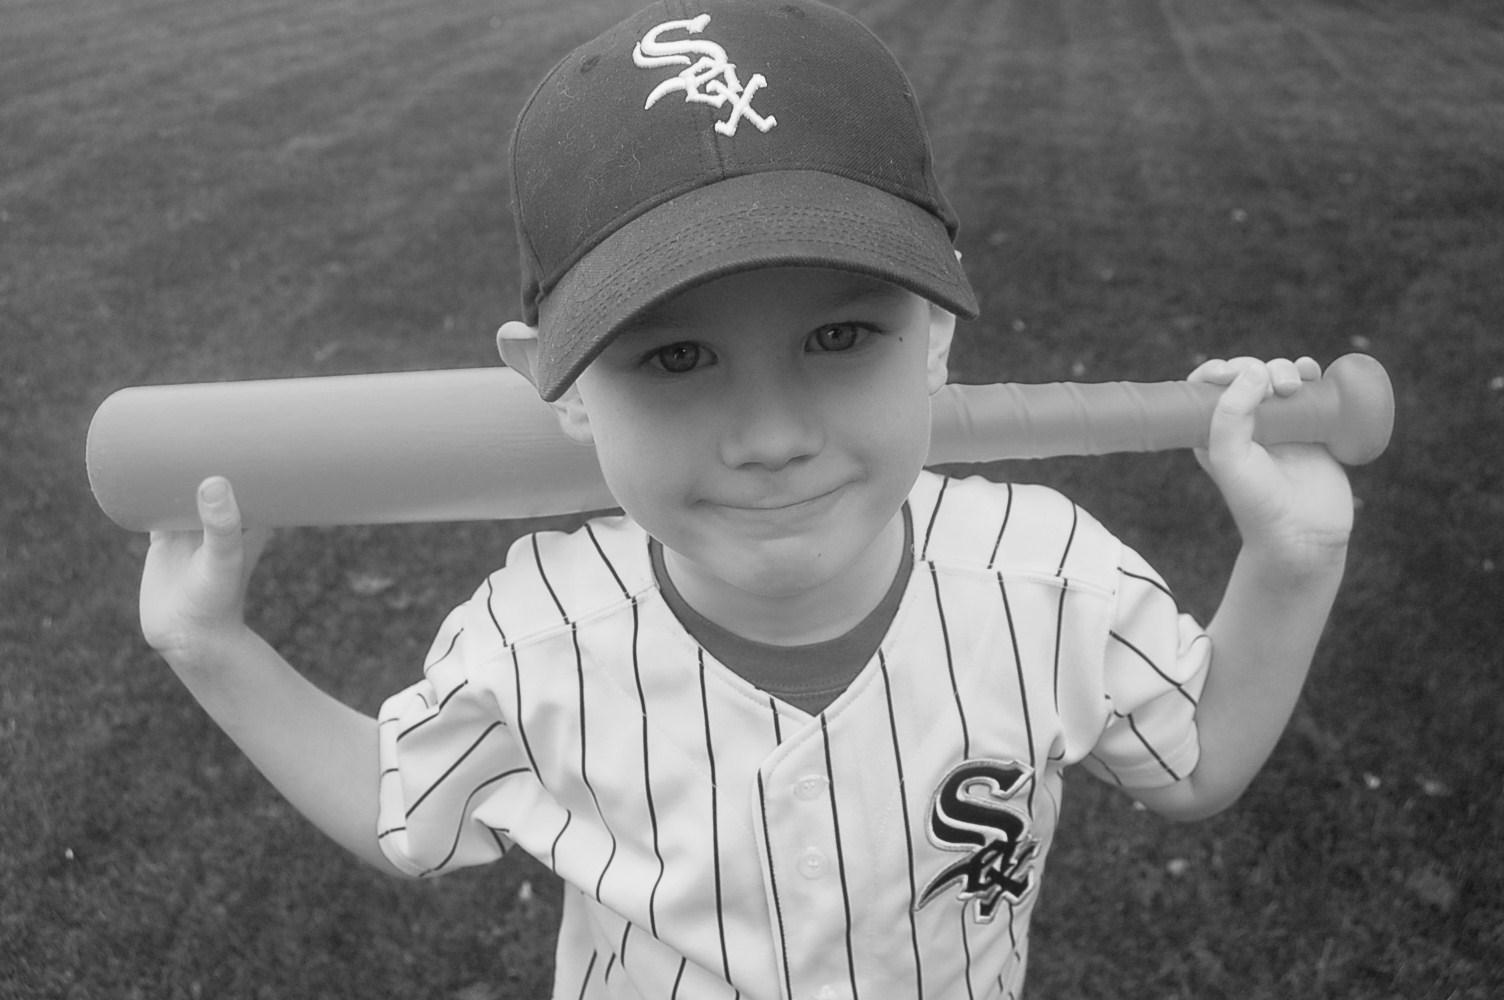 dadncharge did i fail my boy by not teaching him baseball